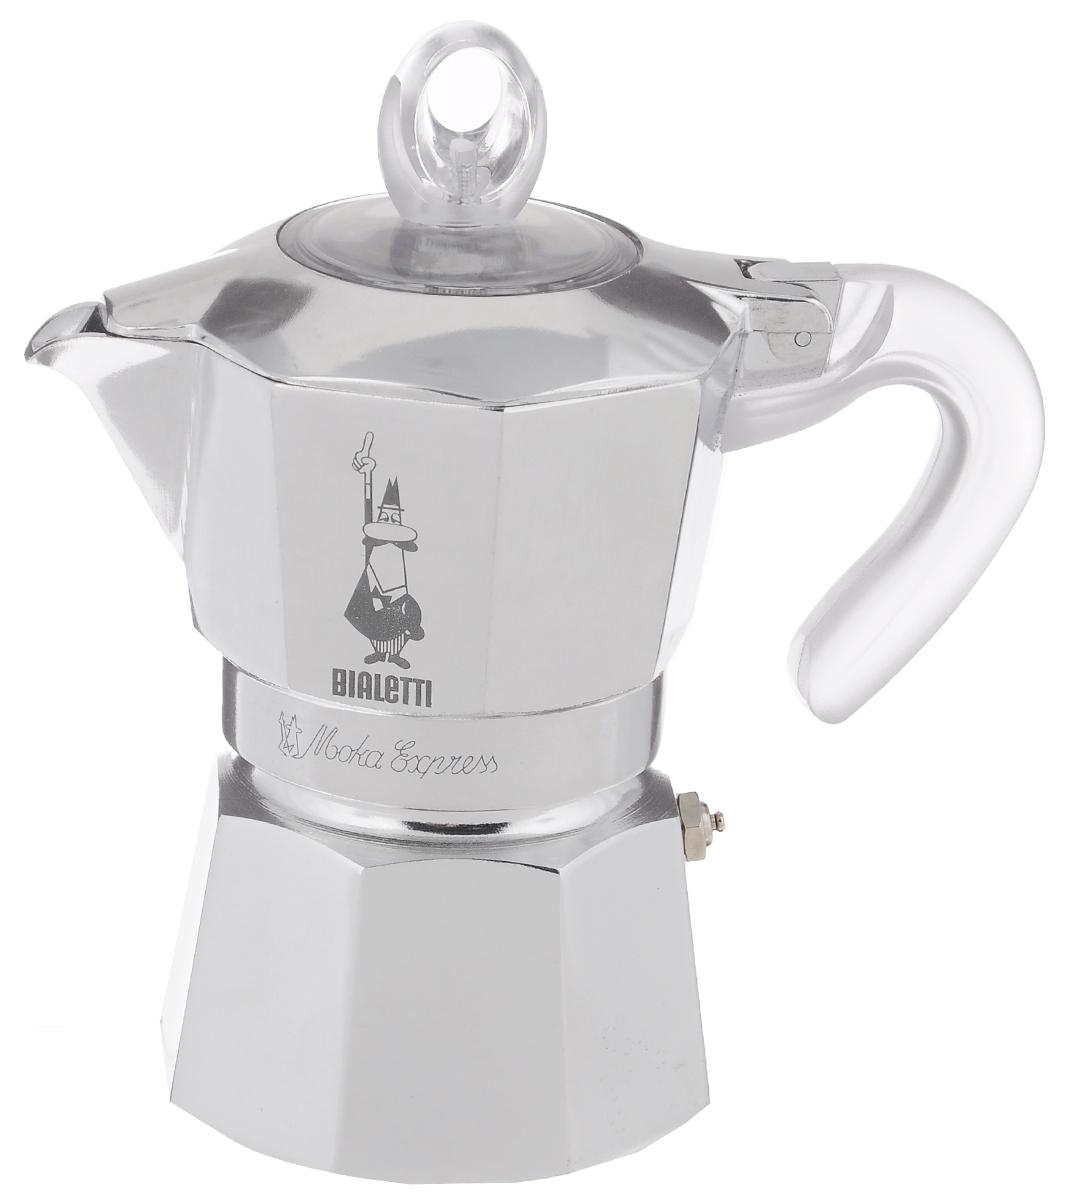 Гейзерная кофеварка Bialetti Moka Glossy, цвет: стальной, на 3 чашки bialetti moka express на 2 порции 1168